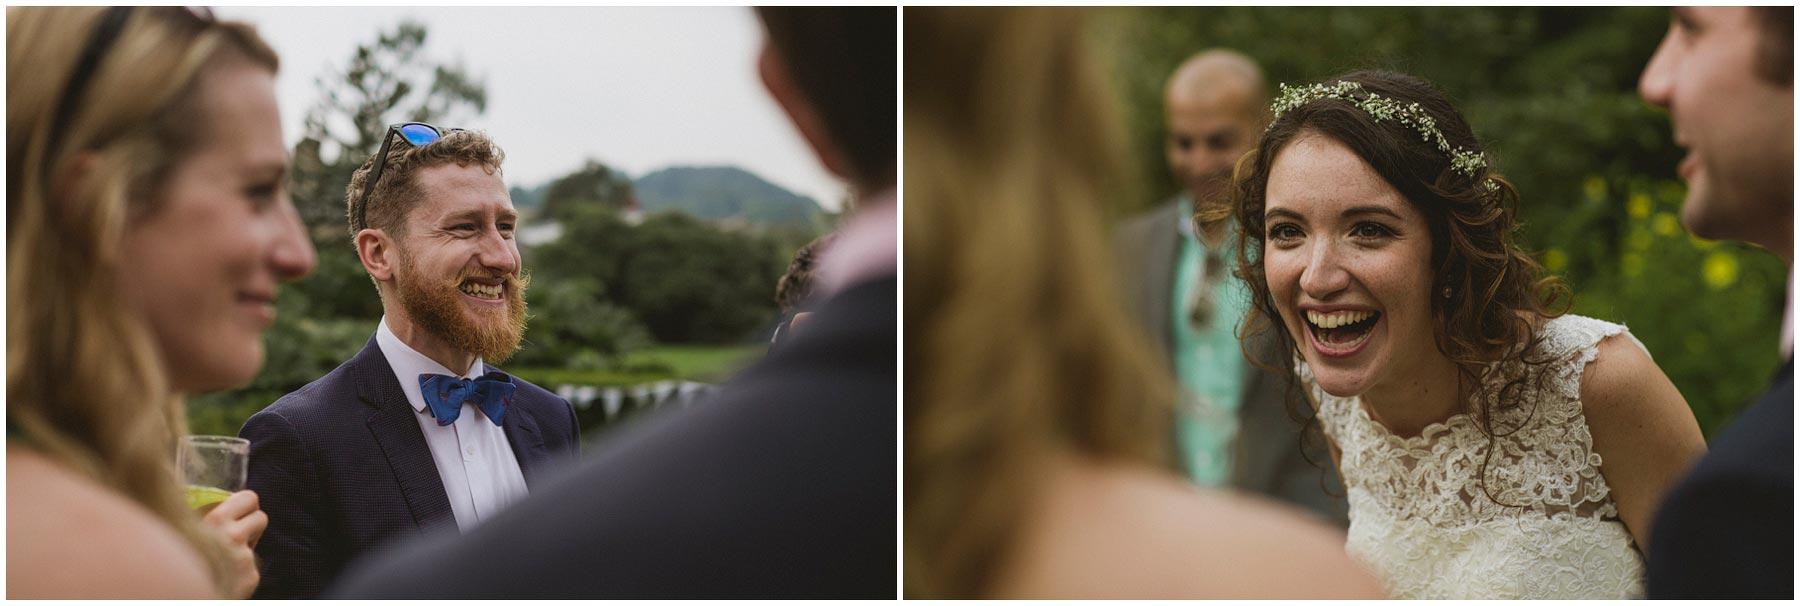 Colehayes-Park-Wedding-Photography_0148